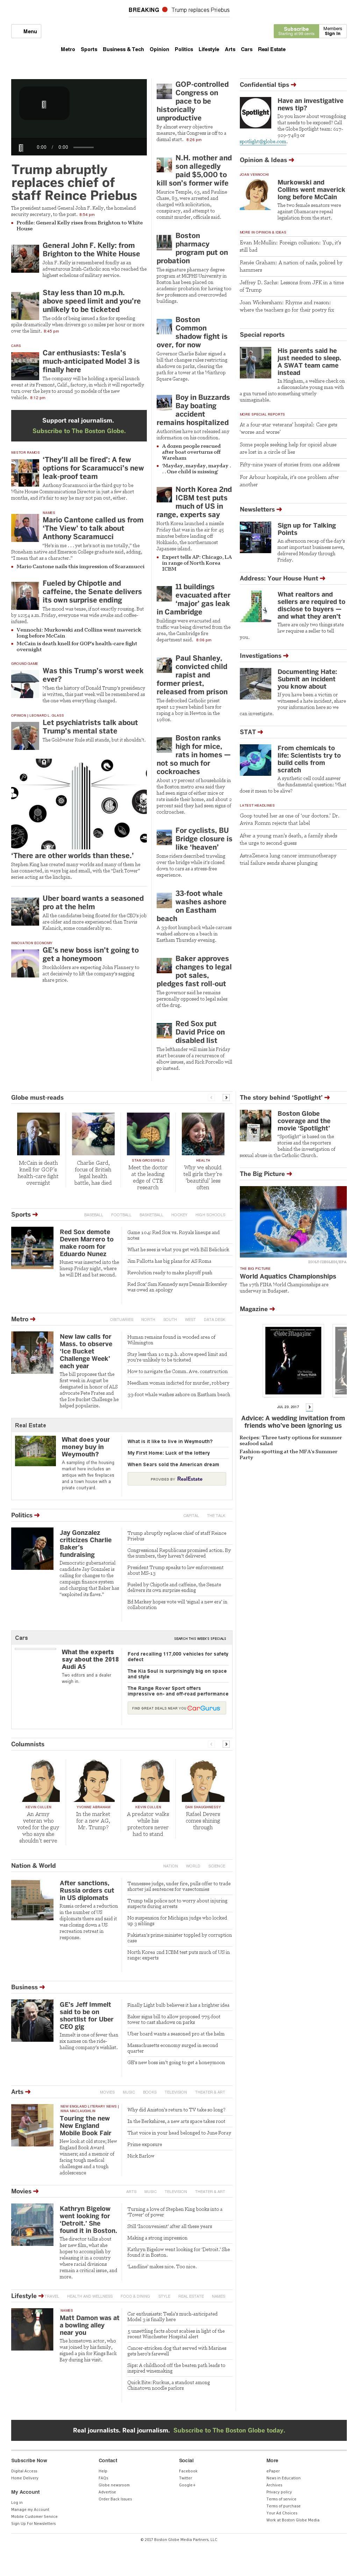 The Boston Globe at Friday July 28, 2017, 11:01 p.m. UTC